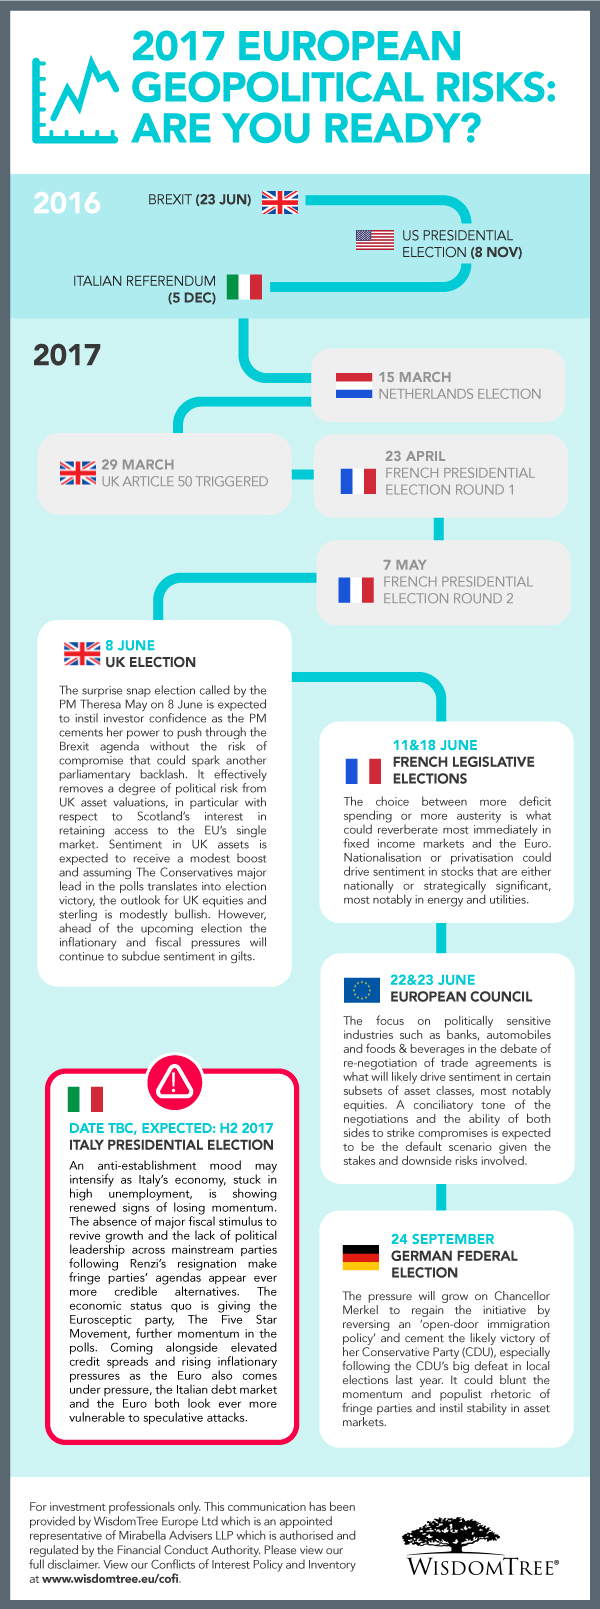 Infographic 2017 European geopolitical risks